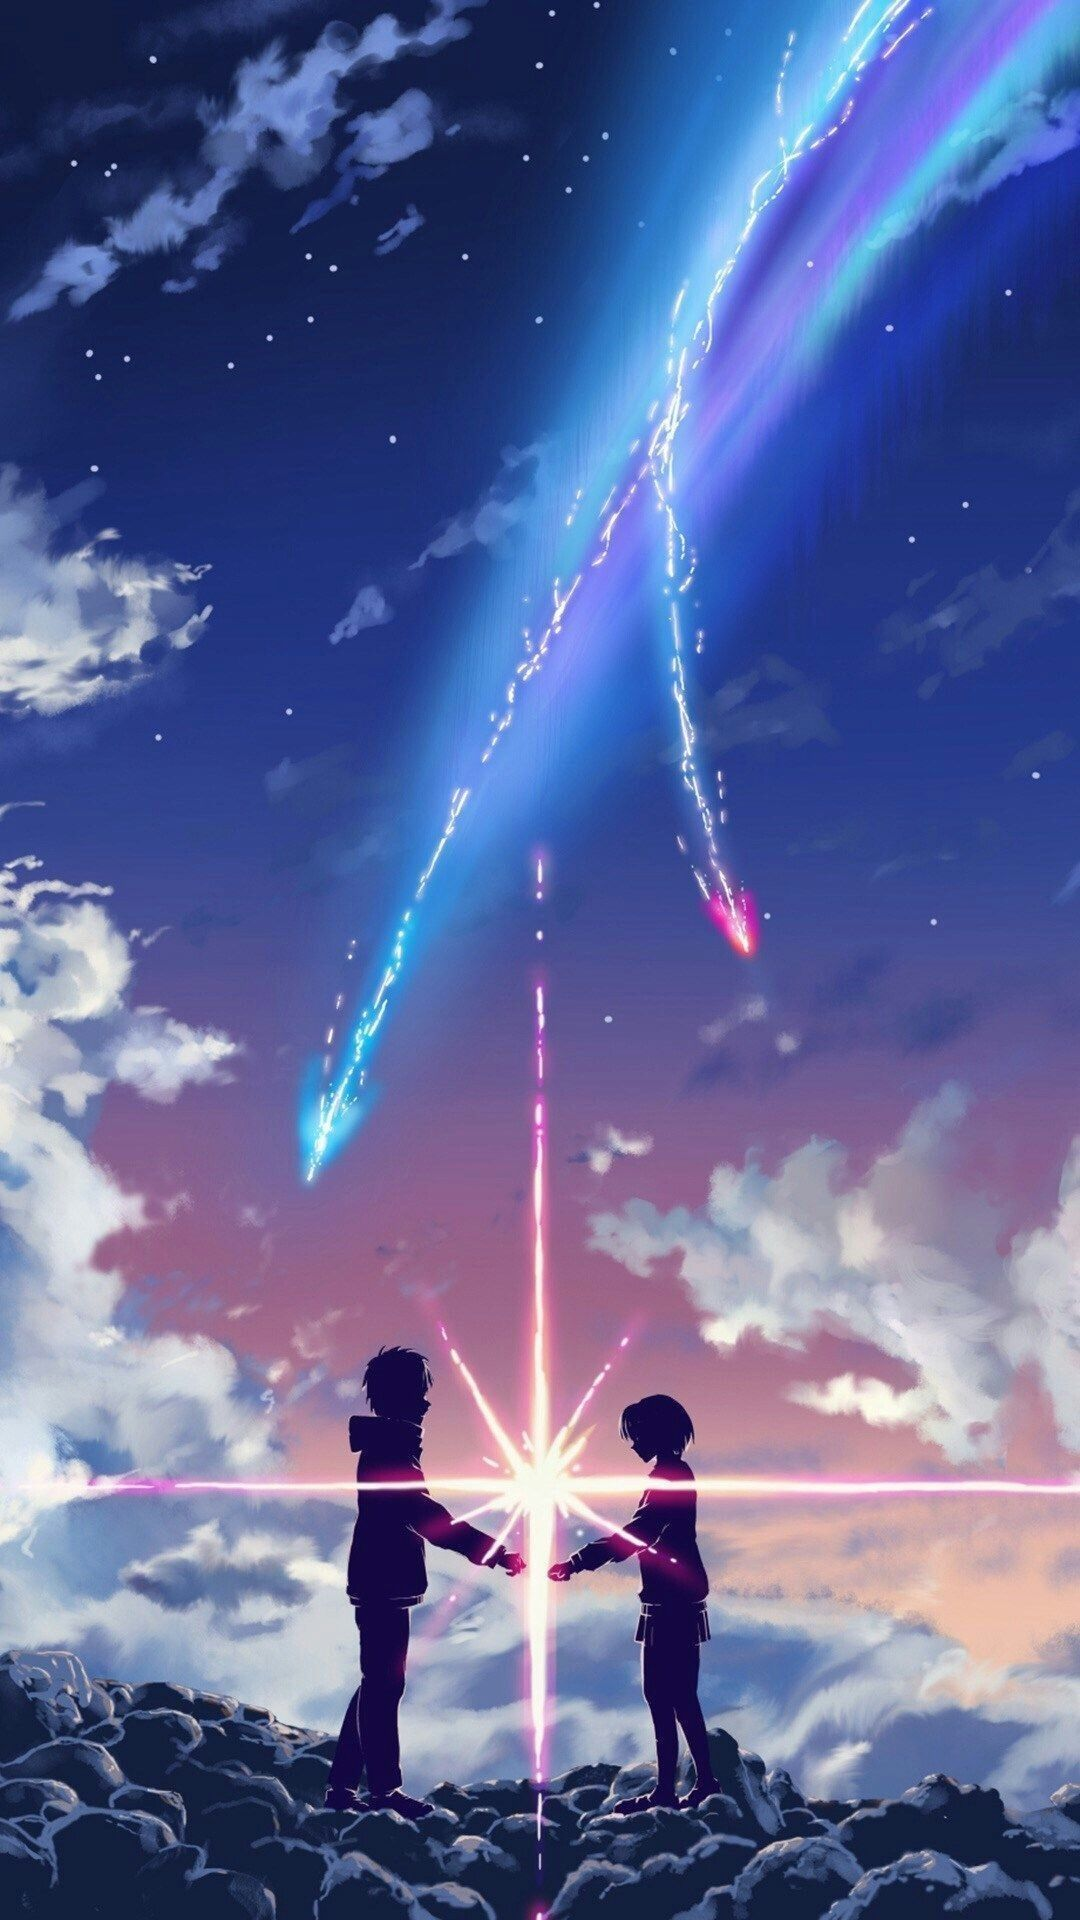 Aesthetic Phone Backgrounds Anime Theme Anime